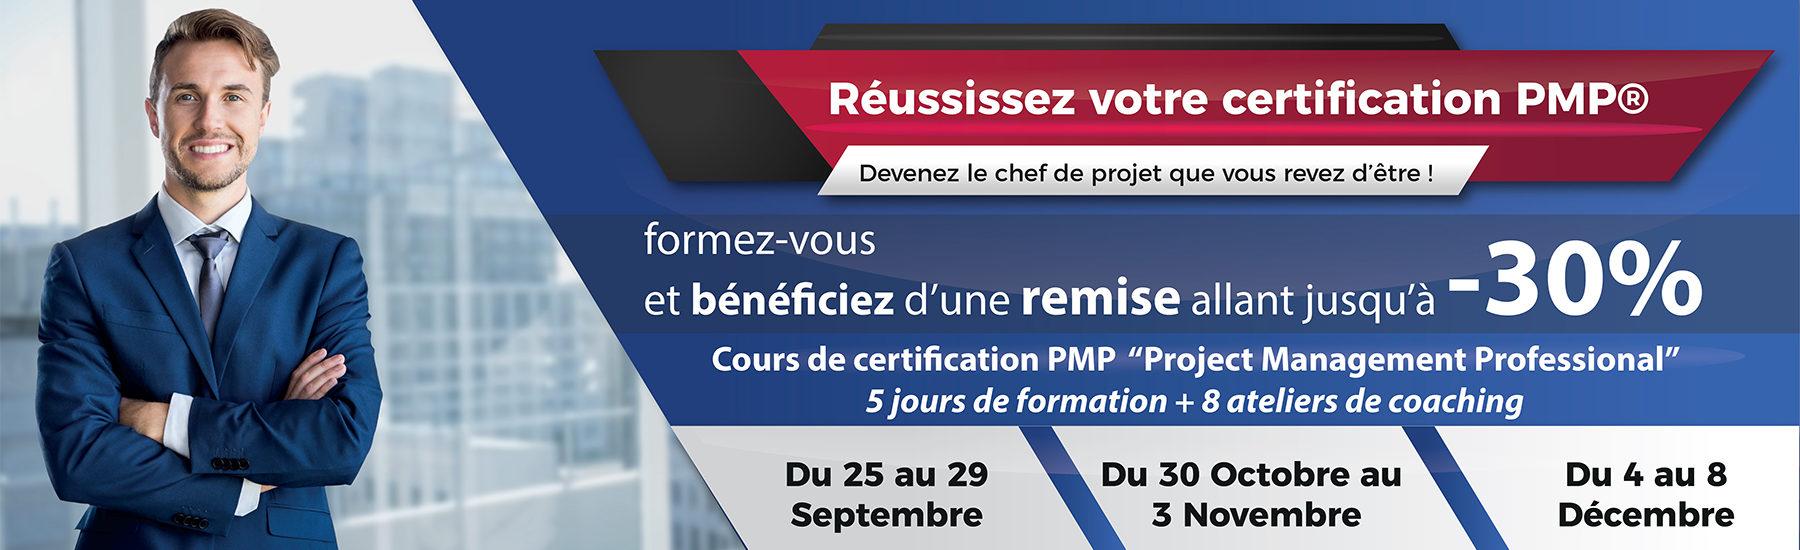 pmp tunisie - pmp tunisia - pmp certification - tspm certification - capm - capm certification - PMI